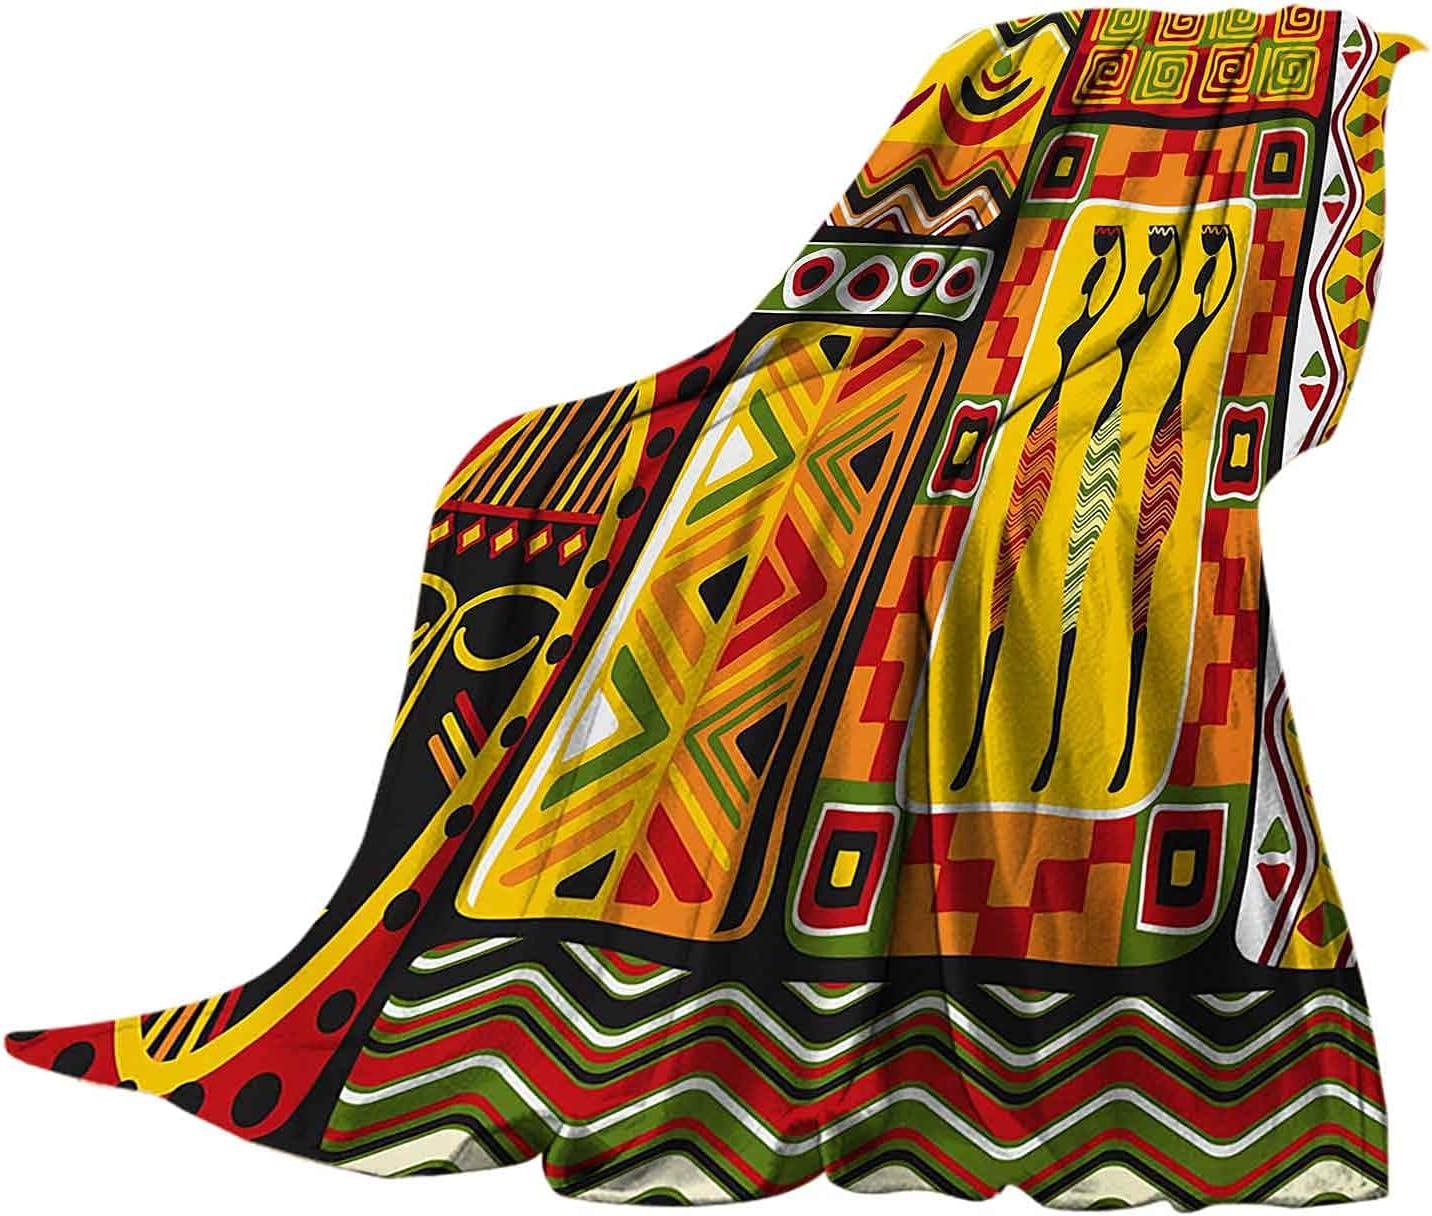 Fleece Bed Max 41% OFF Blanket Elements Historical San Francisco Mall Rec and Striped Original